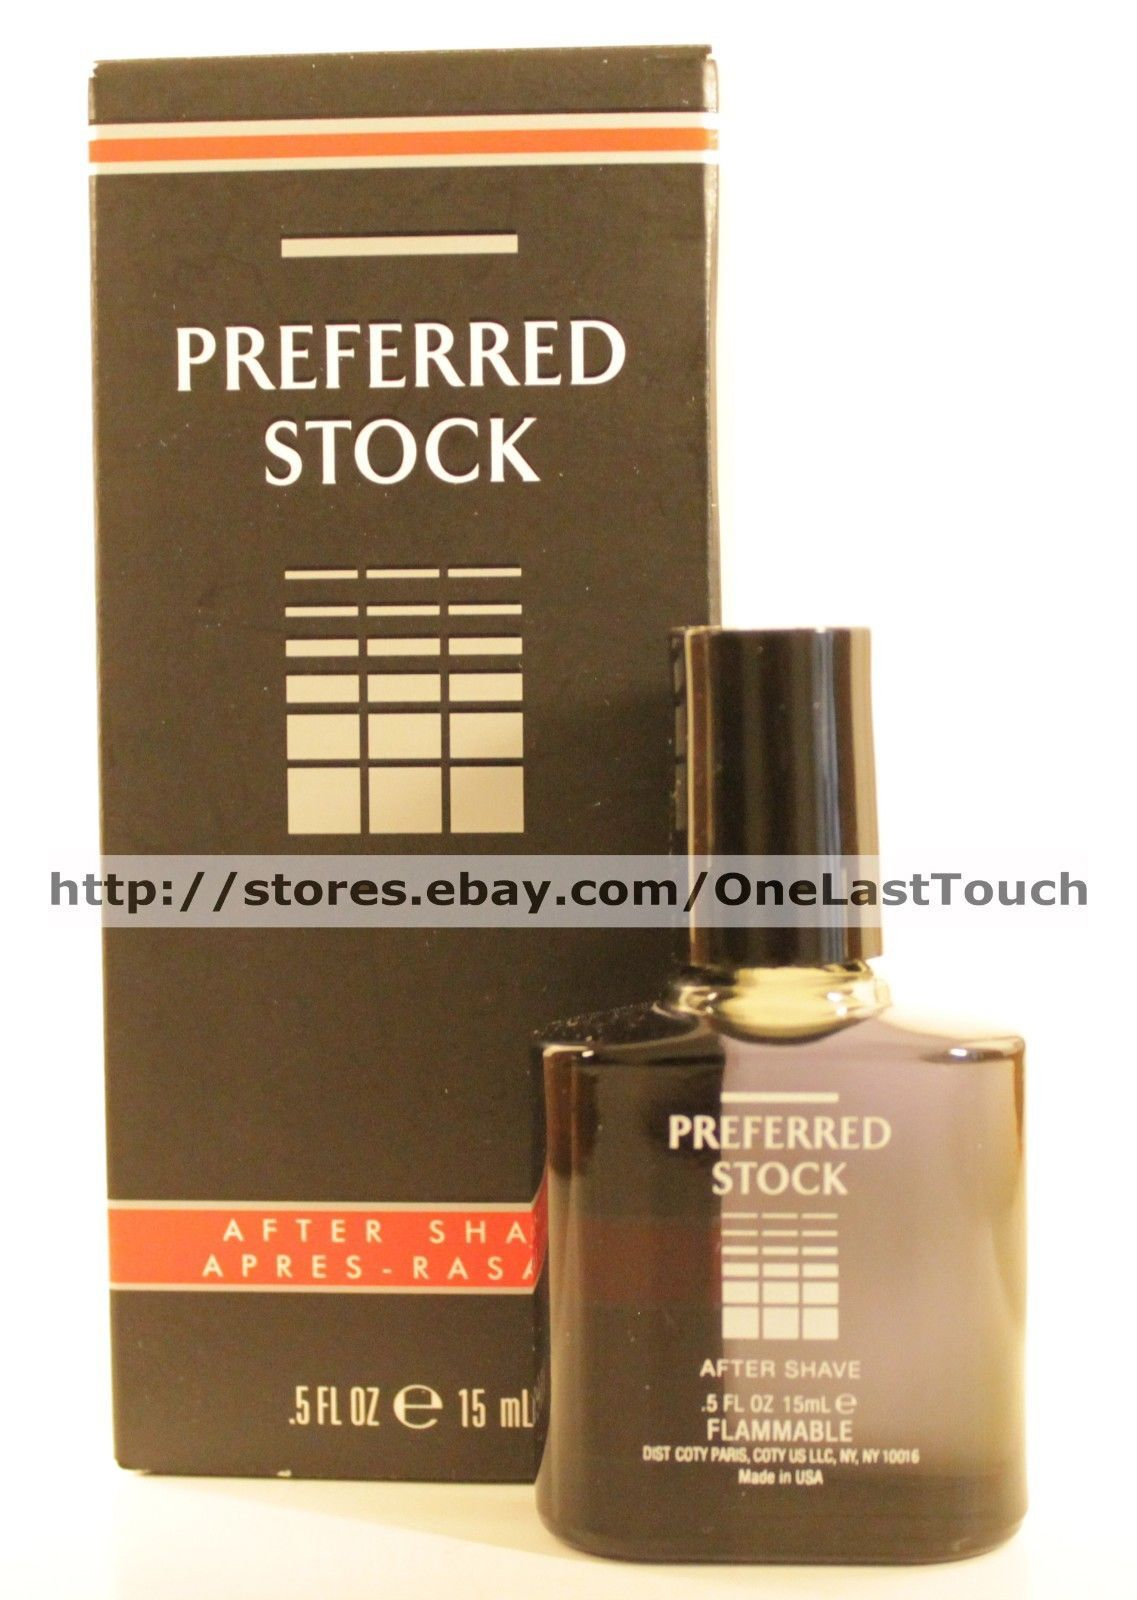 COTY* .5 fl oz PREFERRED STOCK After Shave SPLASH For Men TRAVEL SIZE Gift Boxed